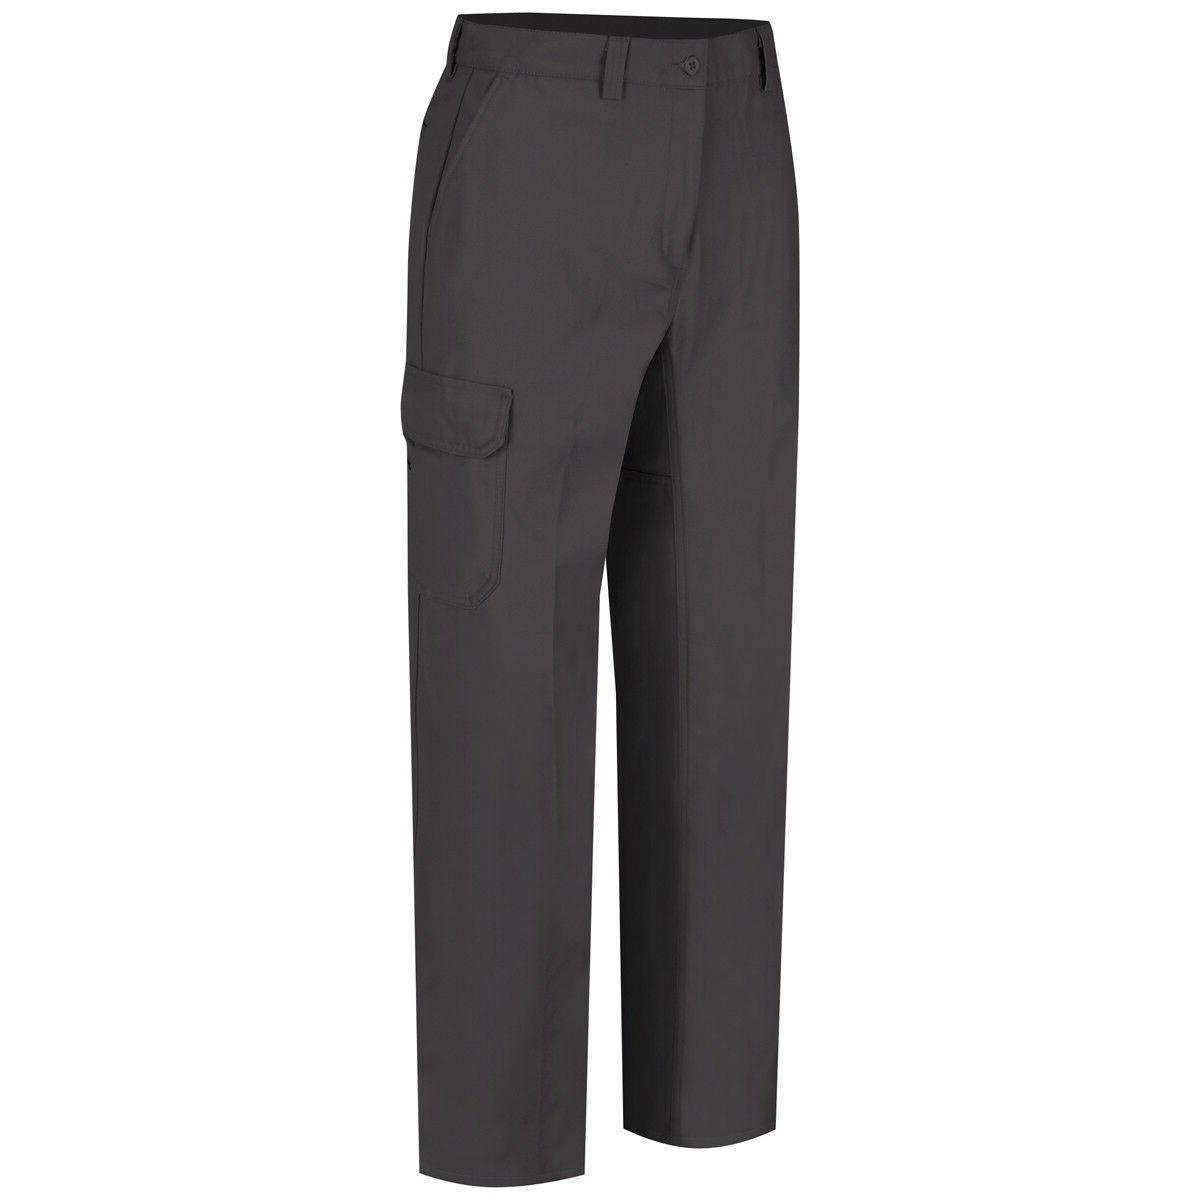 Wrangler Mens Functional Cargo Work Pants, Charcoal